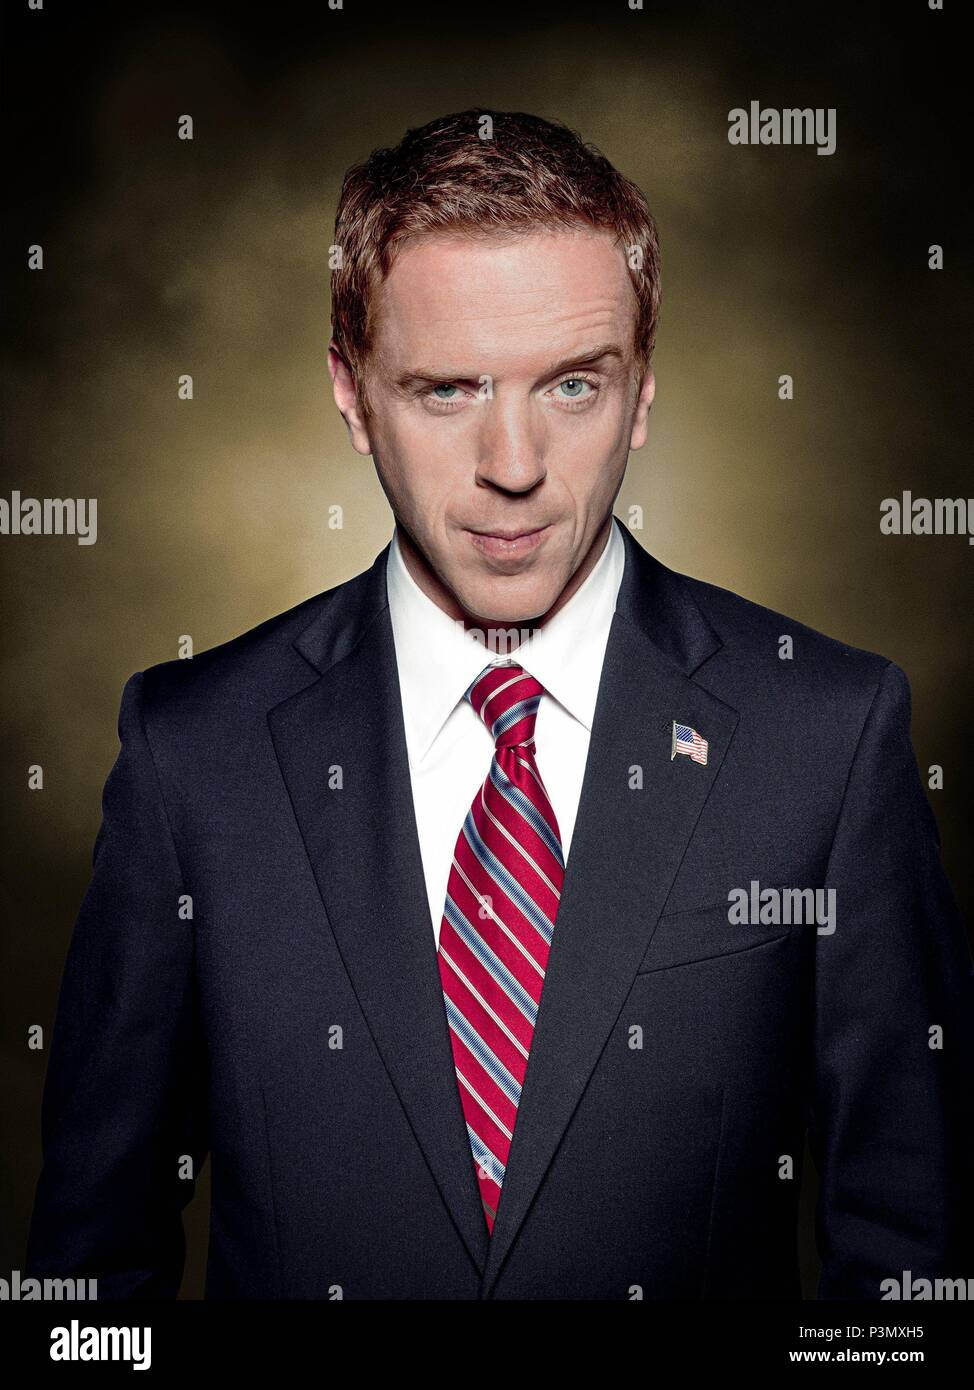 Original Film Title: HOMELAND.  English Title: HOMELAND.  Year: 2011.  Stars: DAMIAN LEWIS. Credit: FOX 21 / Album - Stock Image